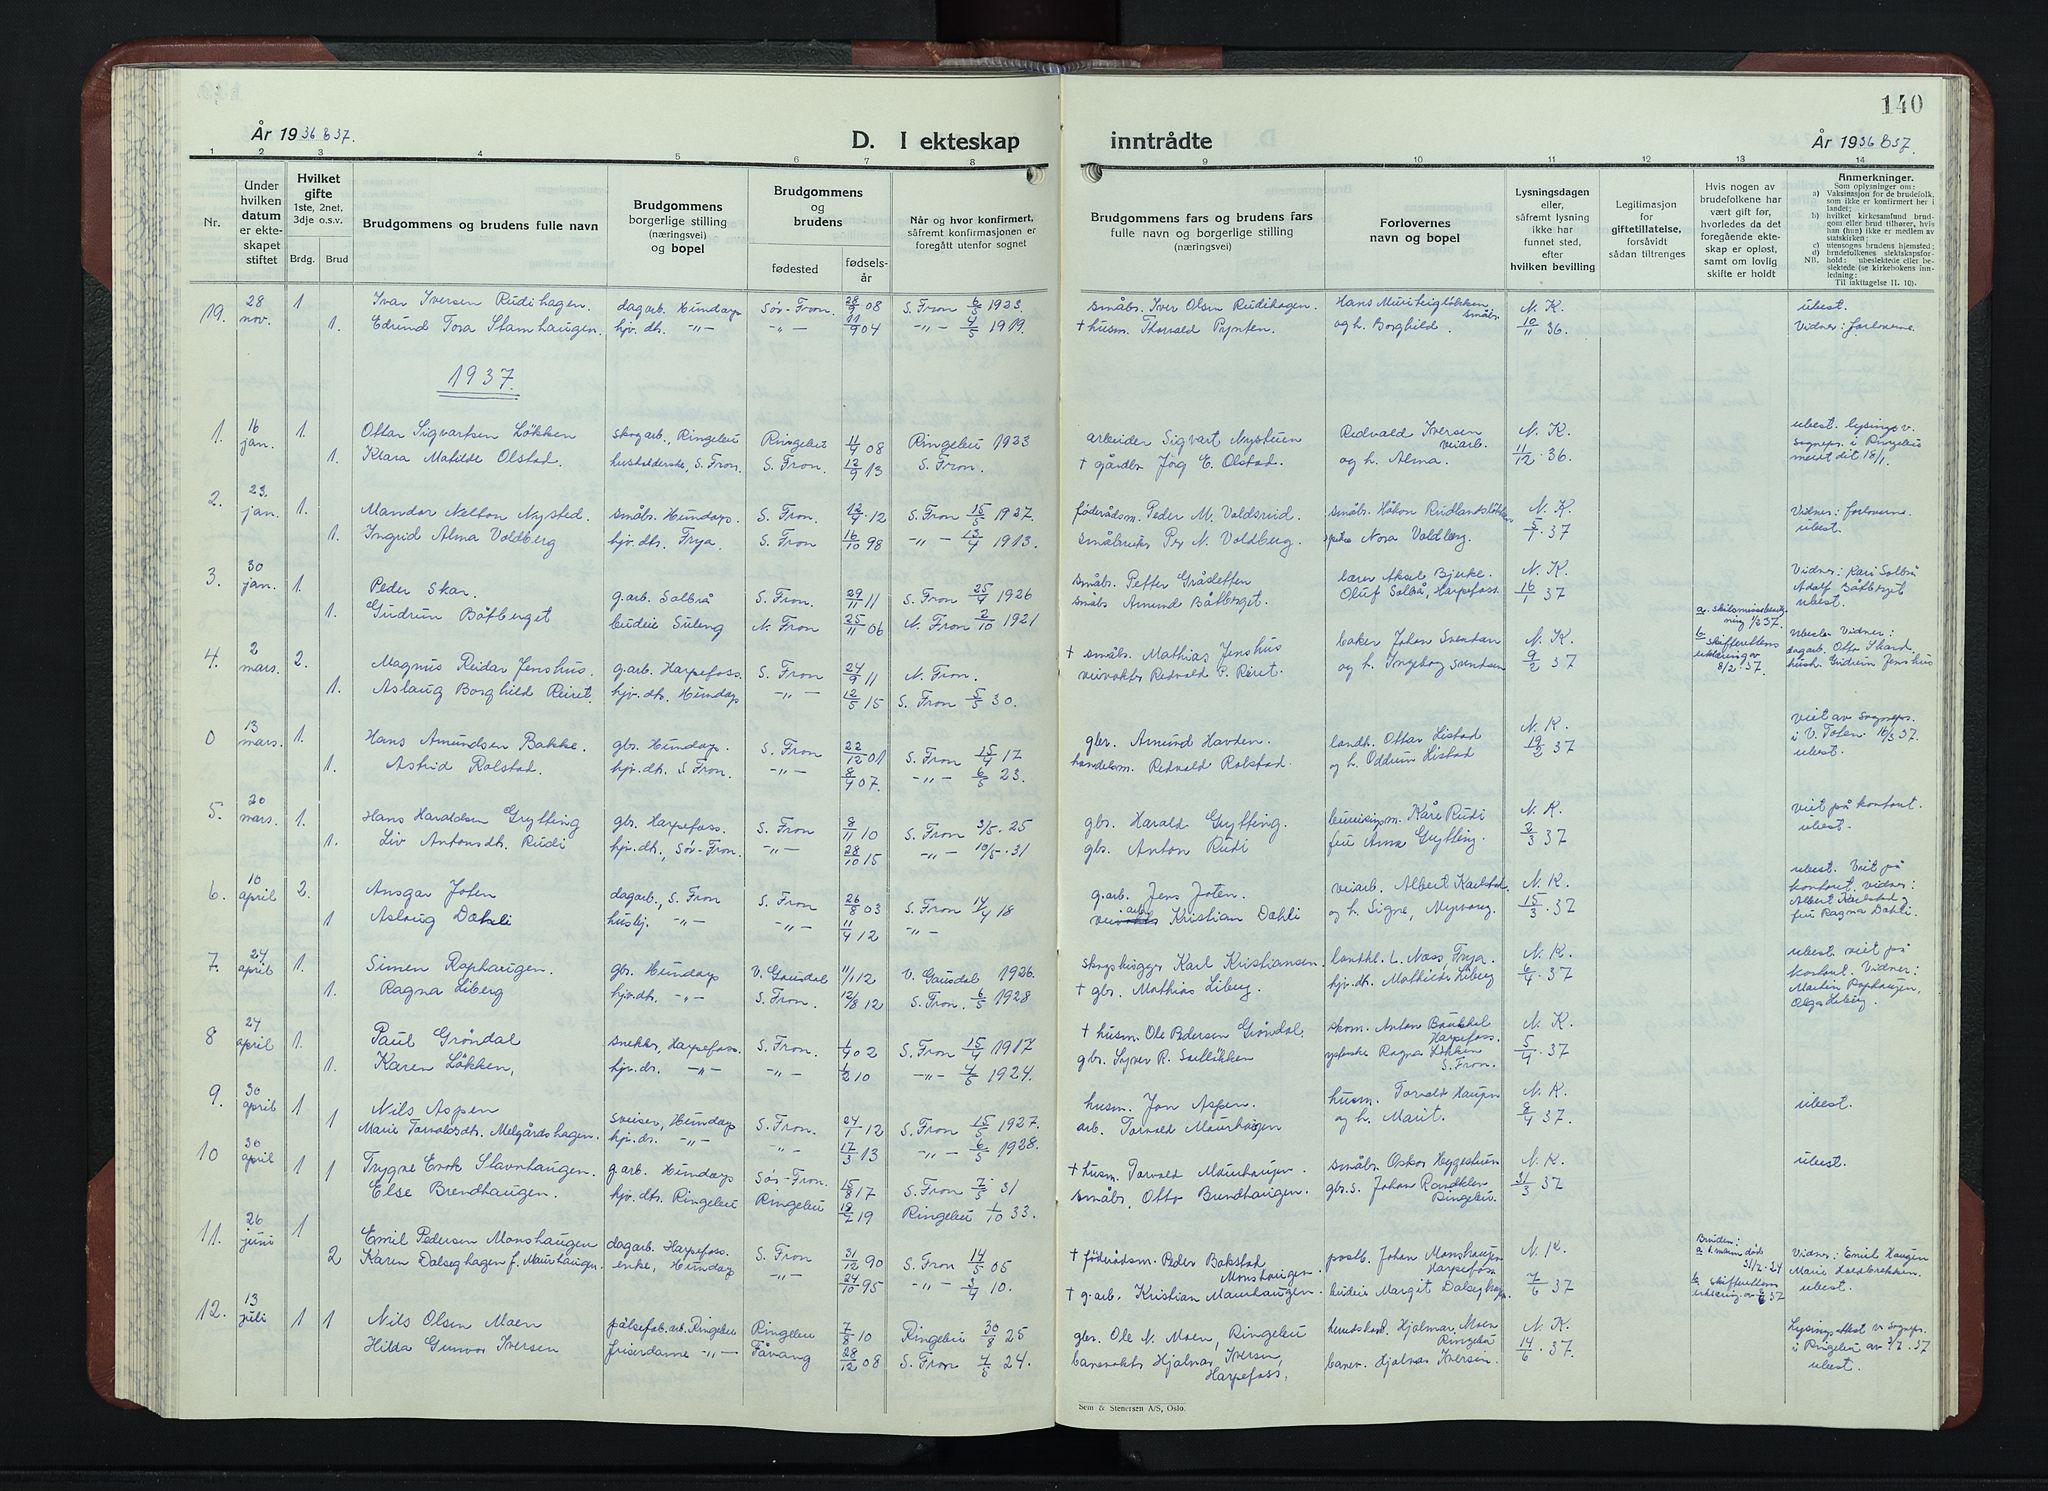 SAH, Sør-Fron prestekontor, H/Ha/Hab/L0006: Klokkerbok nr. 6, 1933-1948, s. 140